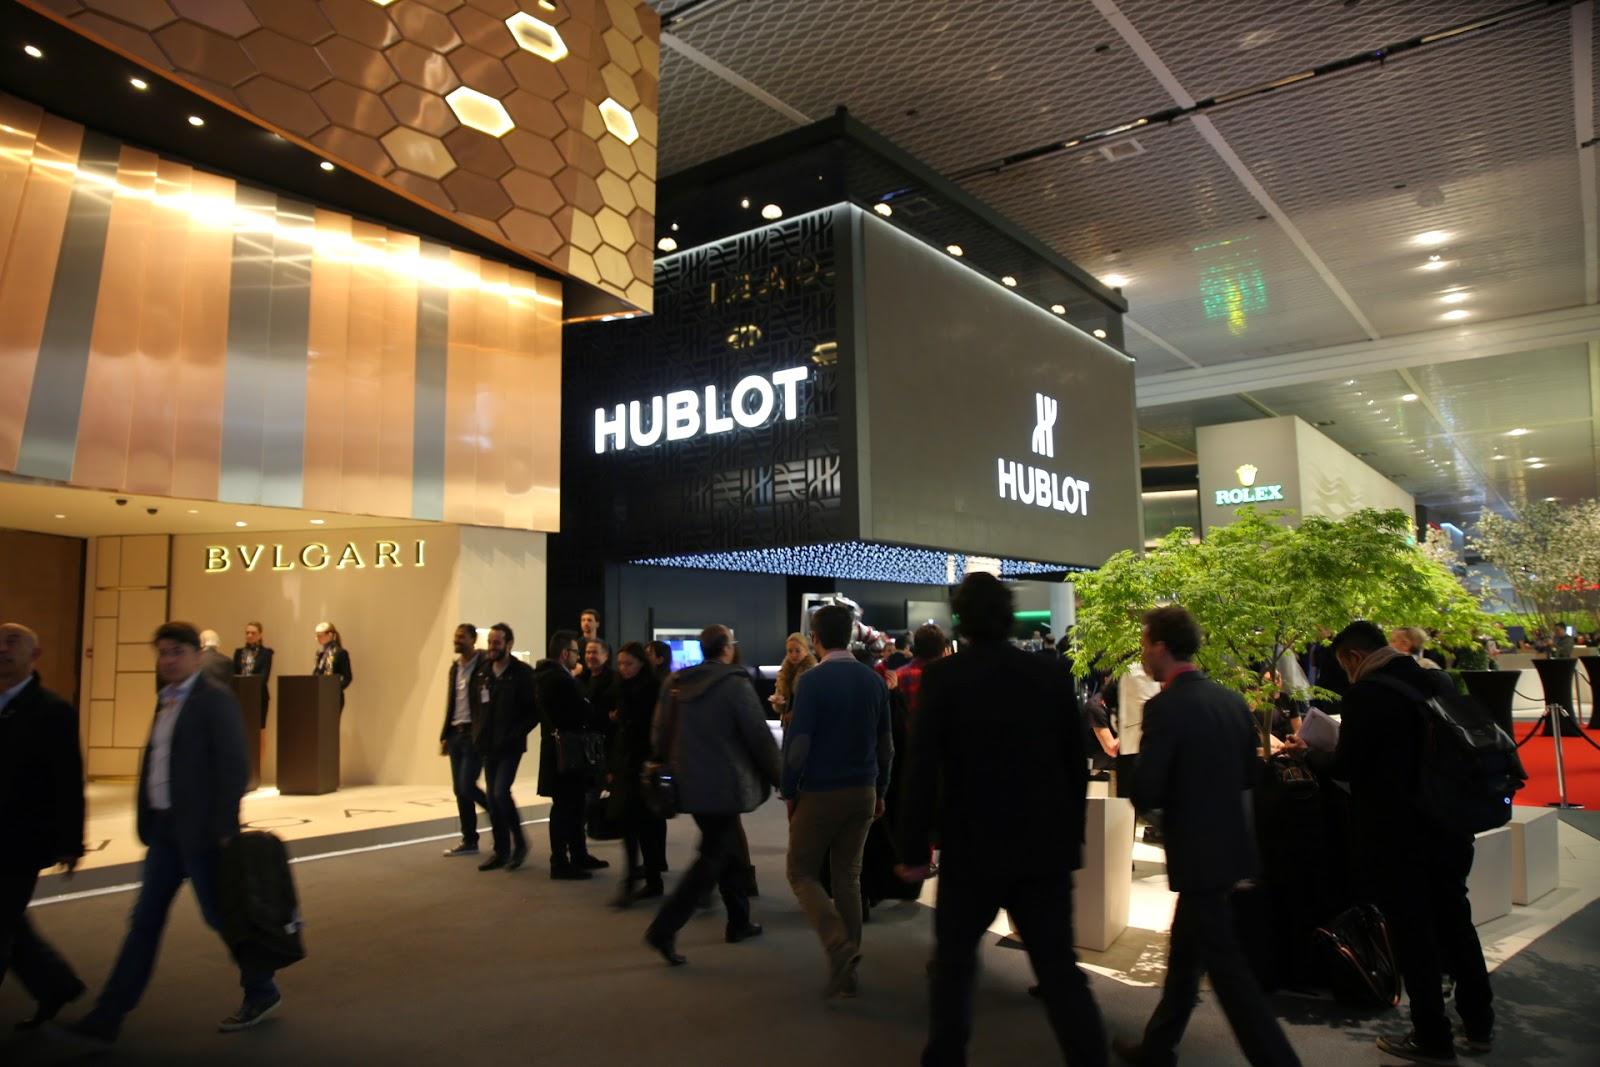 Hublot Basel 2015